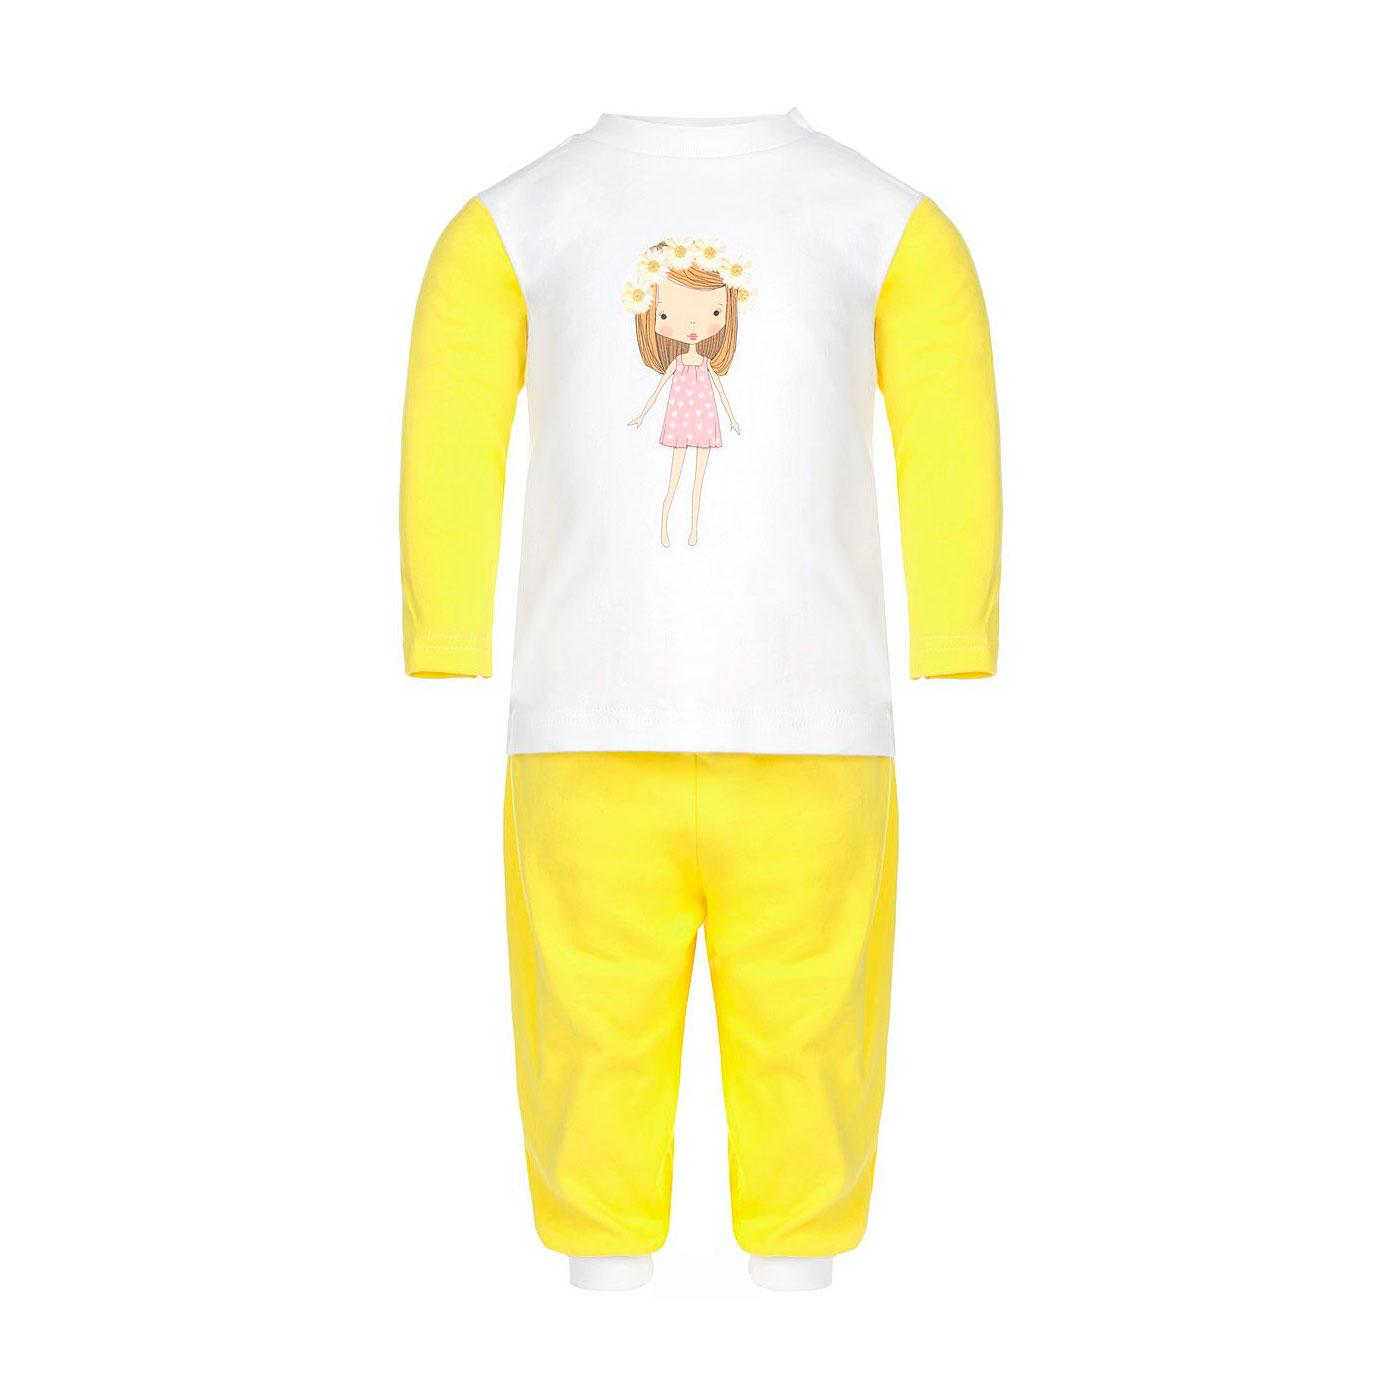 Пижама Котмаркот Ромашки рост 98 желтый<br>